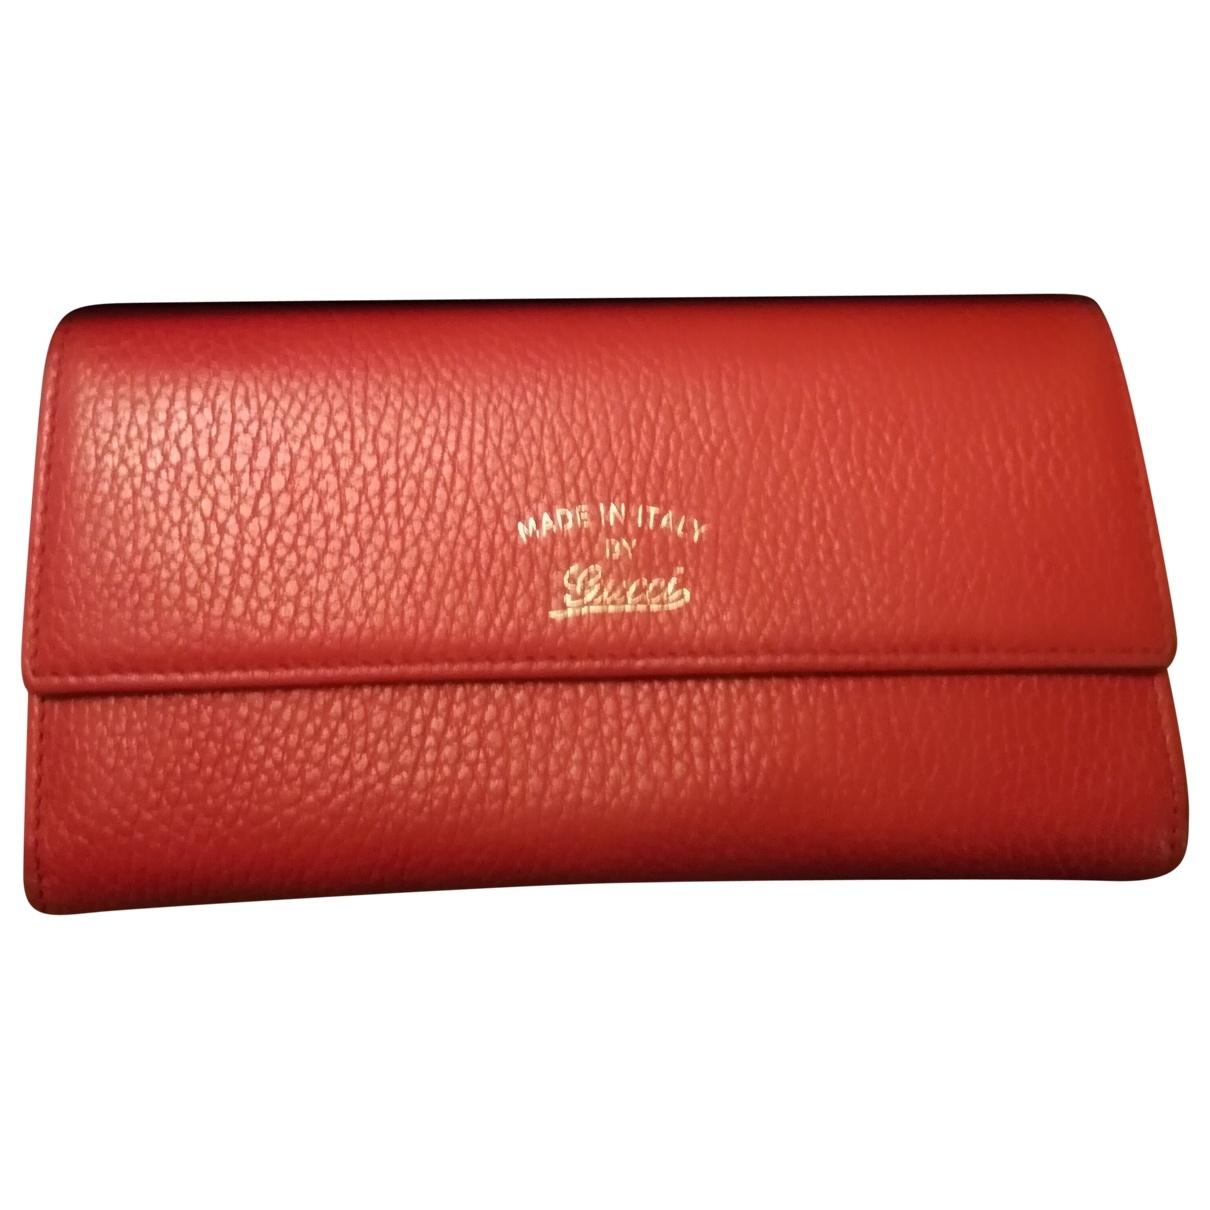 Gucci \N Orange Leather wallet for Women \N